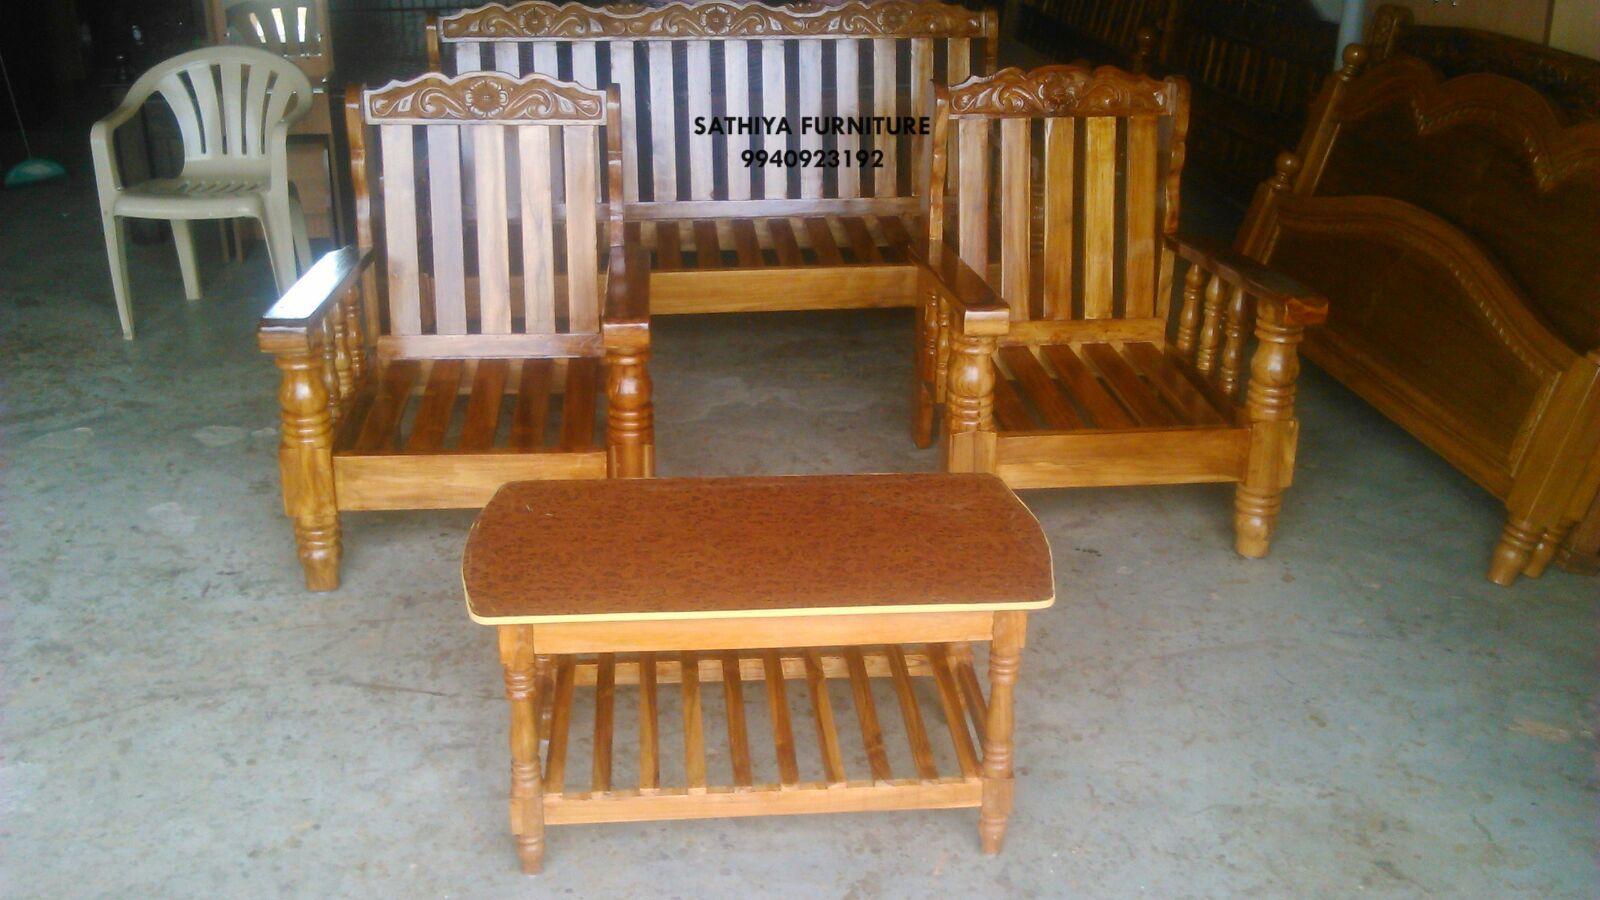 Furniture Wood Sofa Photos In 2020 Wooden Sofa Sofa Set Designs Latest Wooden Sofa Designs